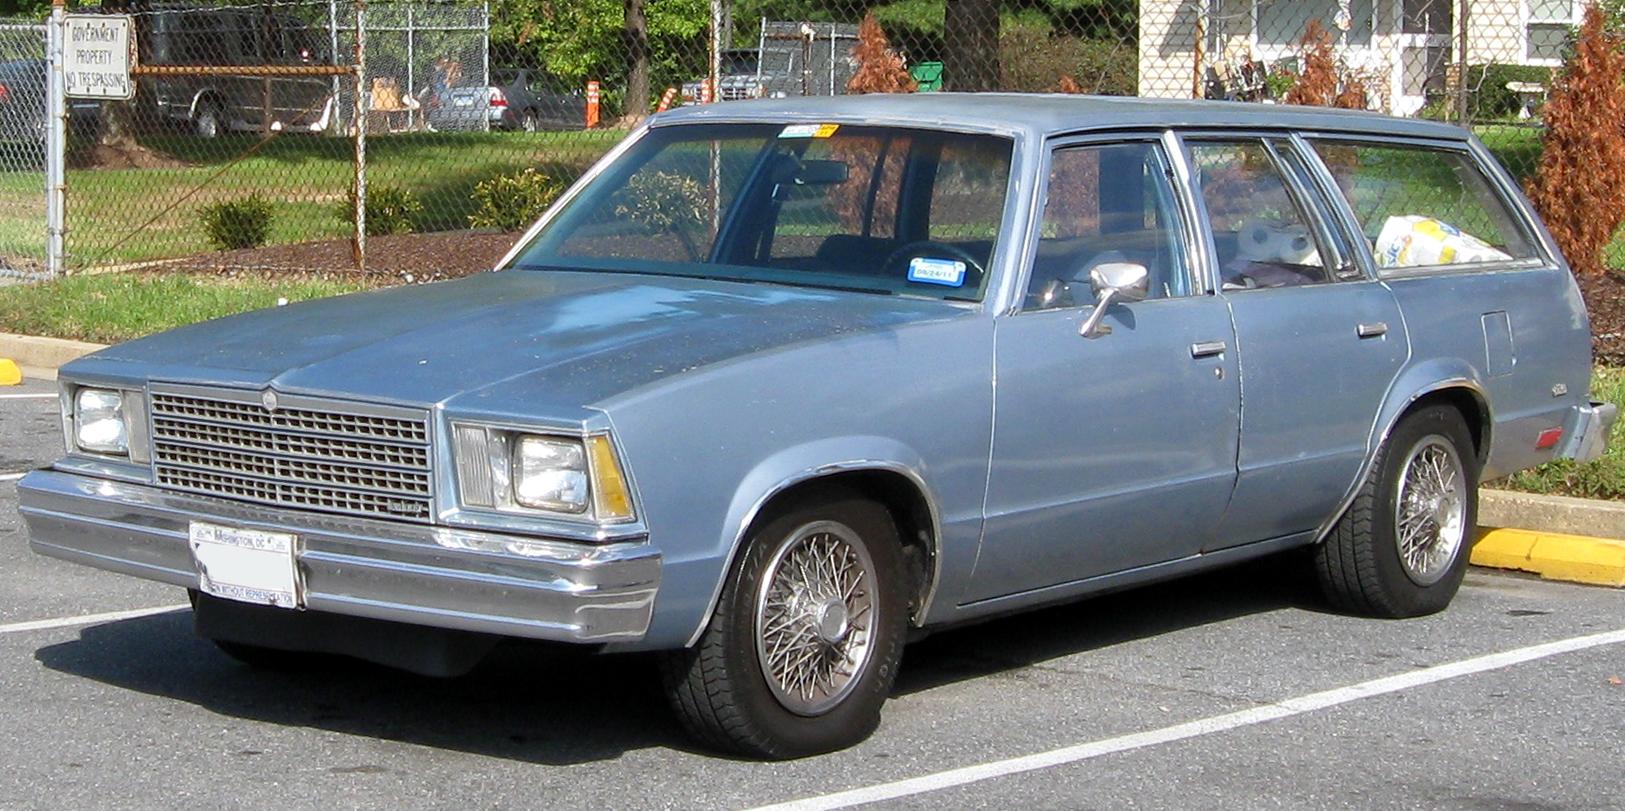 1980_Chevrolet_Malibu_wagon_front_--_10-21-2010